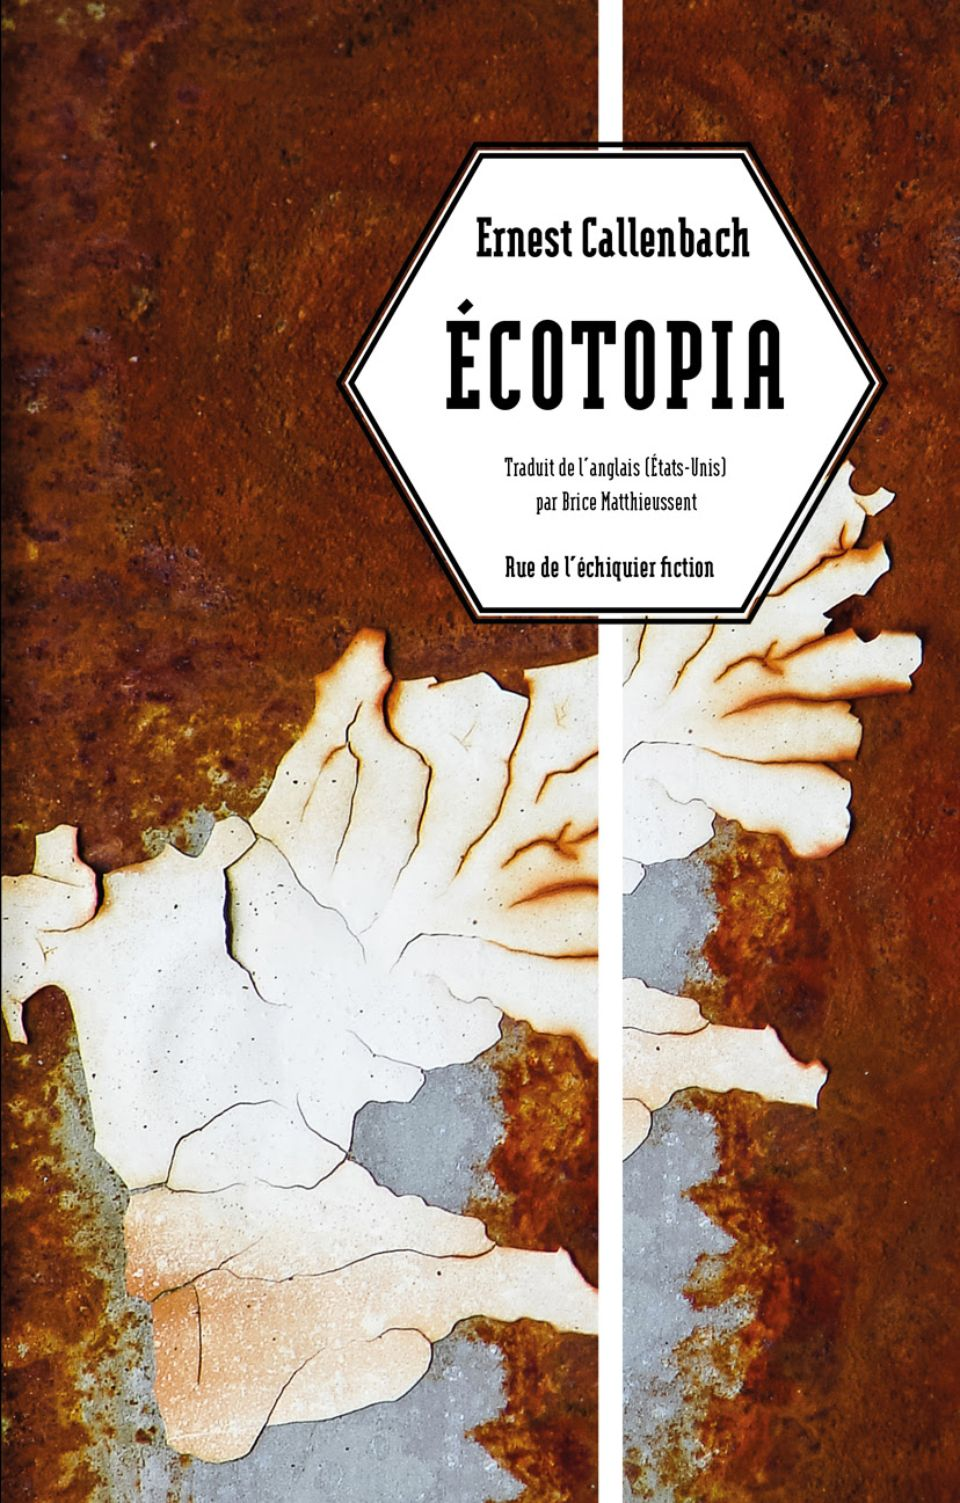 livre-Ecotopia-Ernest-Callenbach-culturclub.jpg